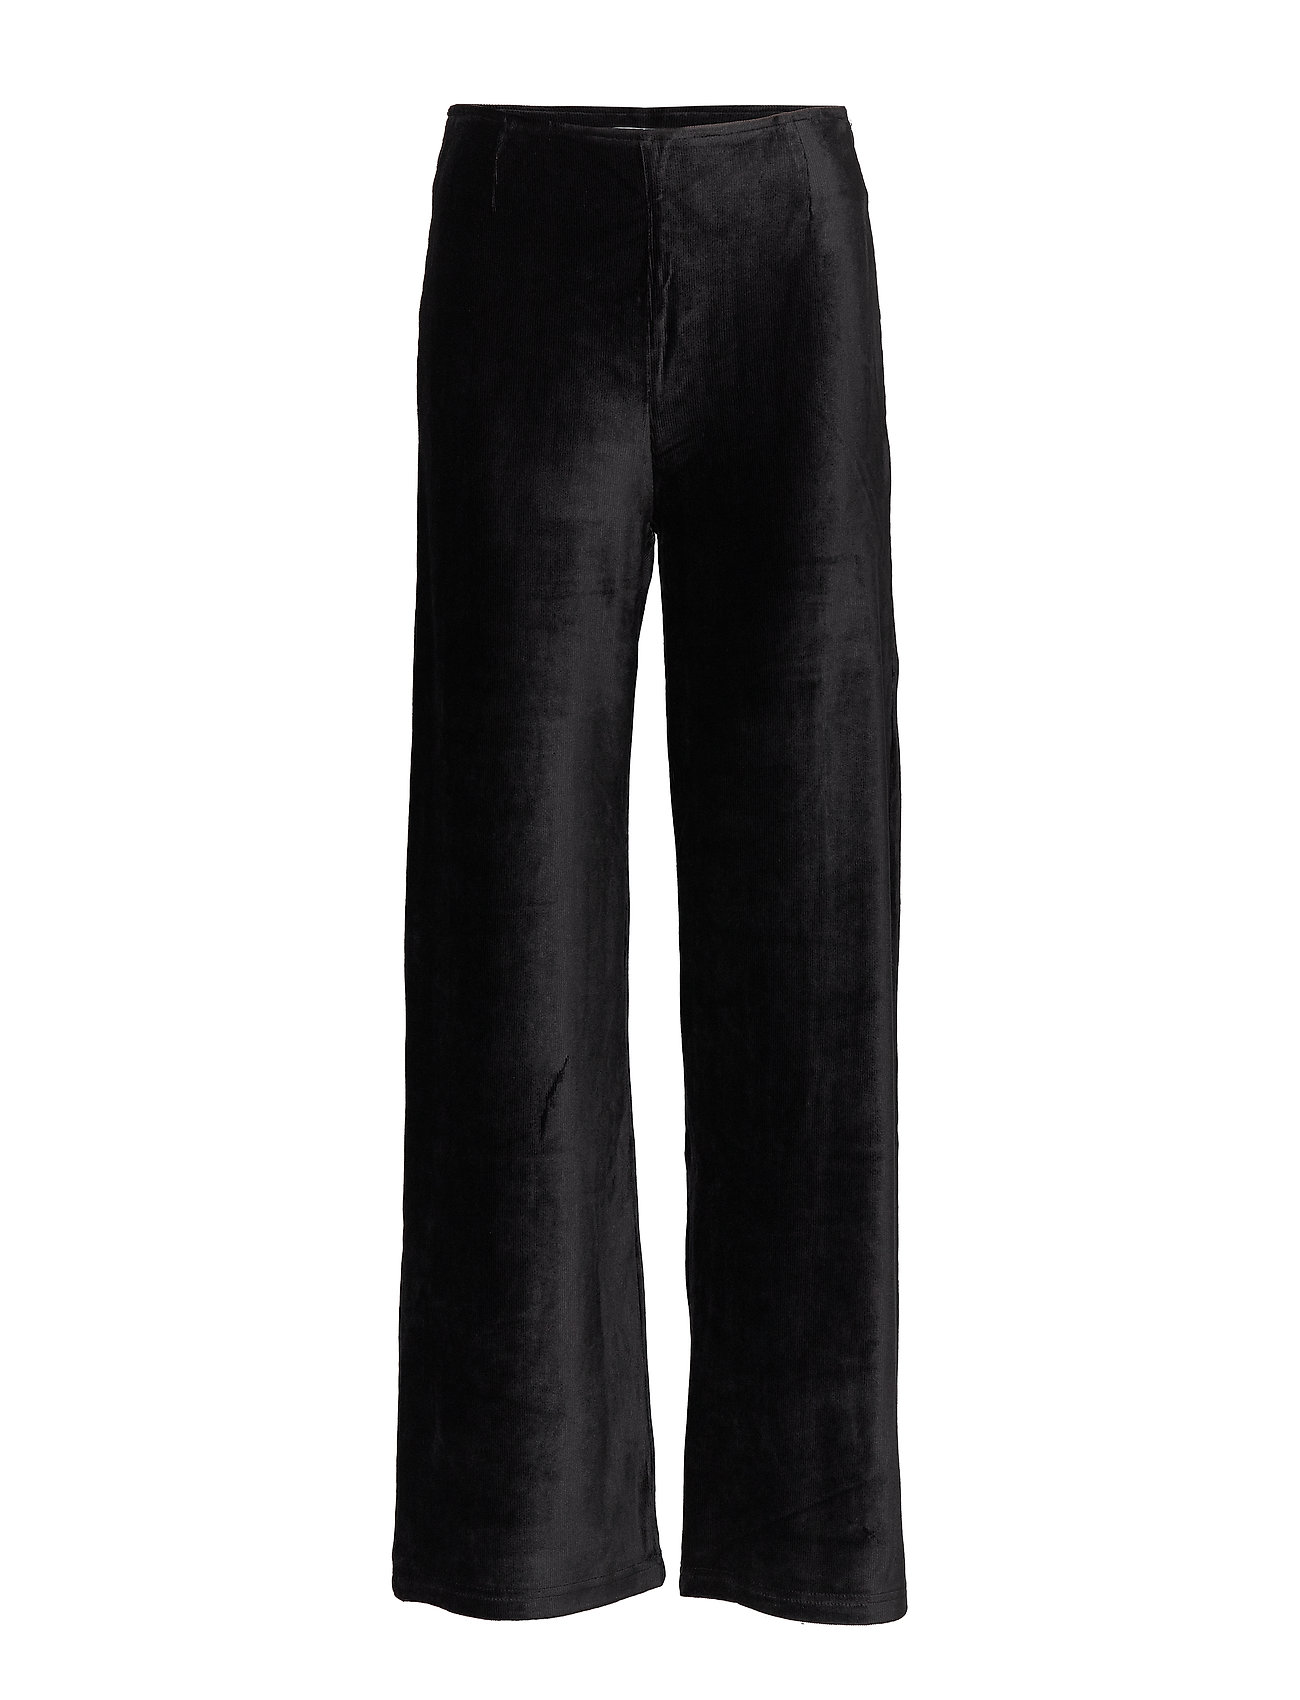 Pulz Jeans Pzpetonia Pant (Black), 360